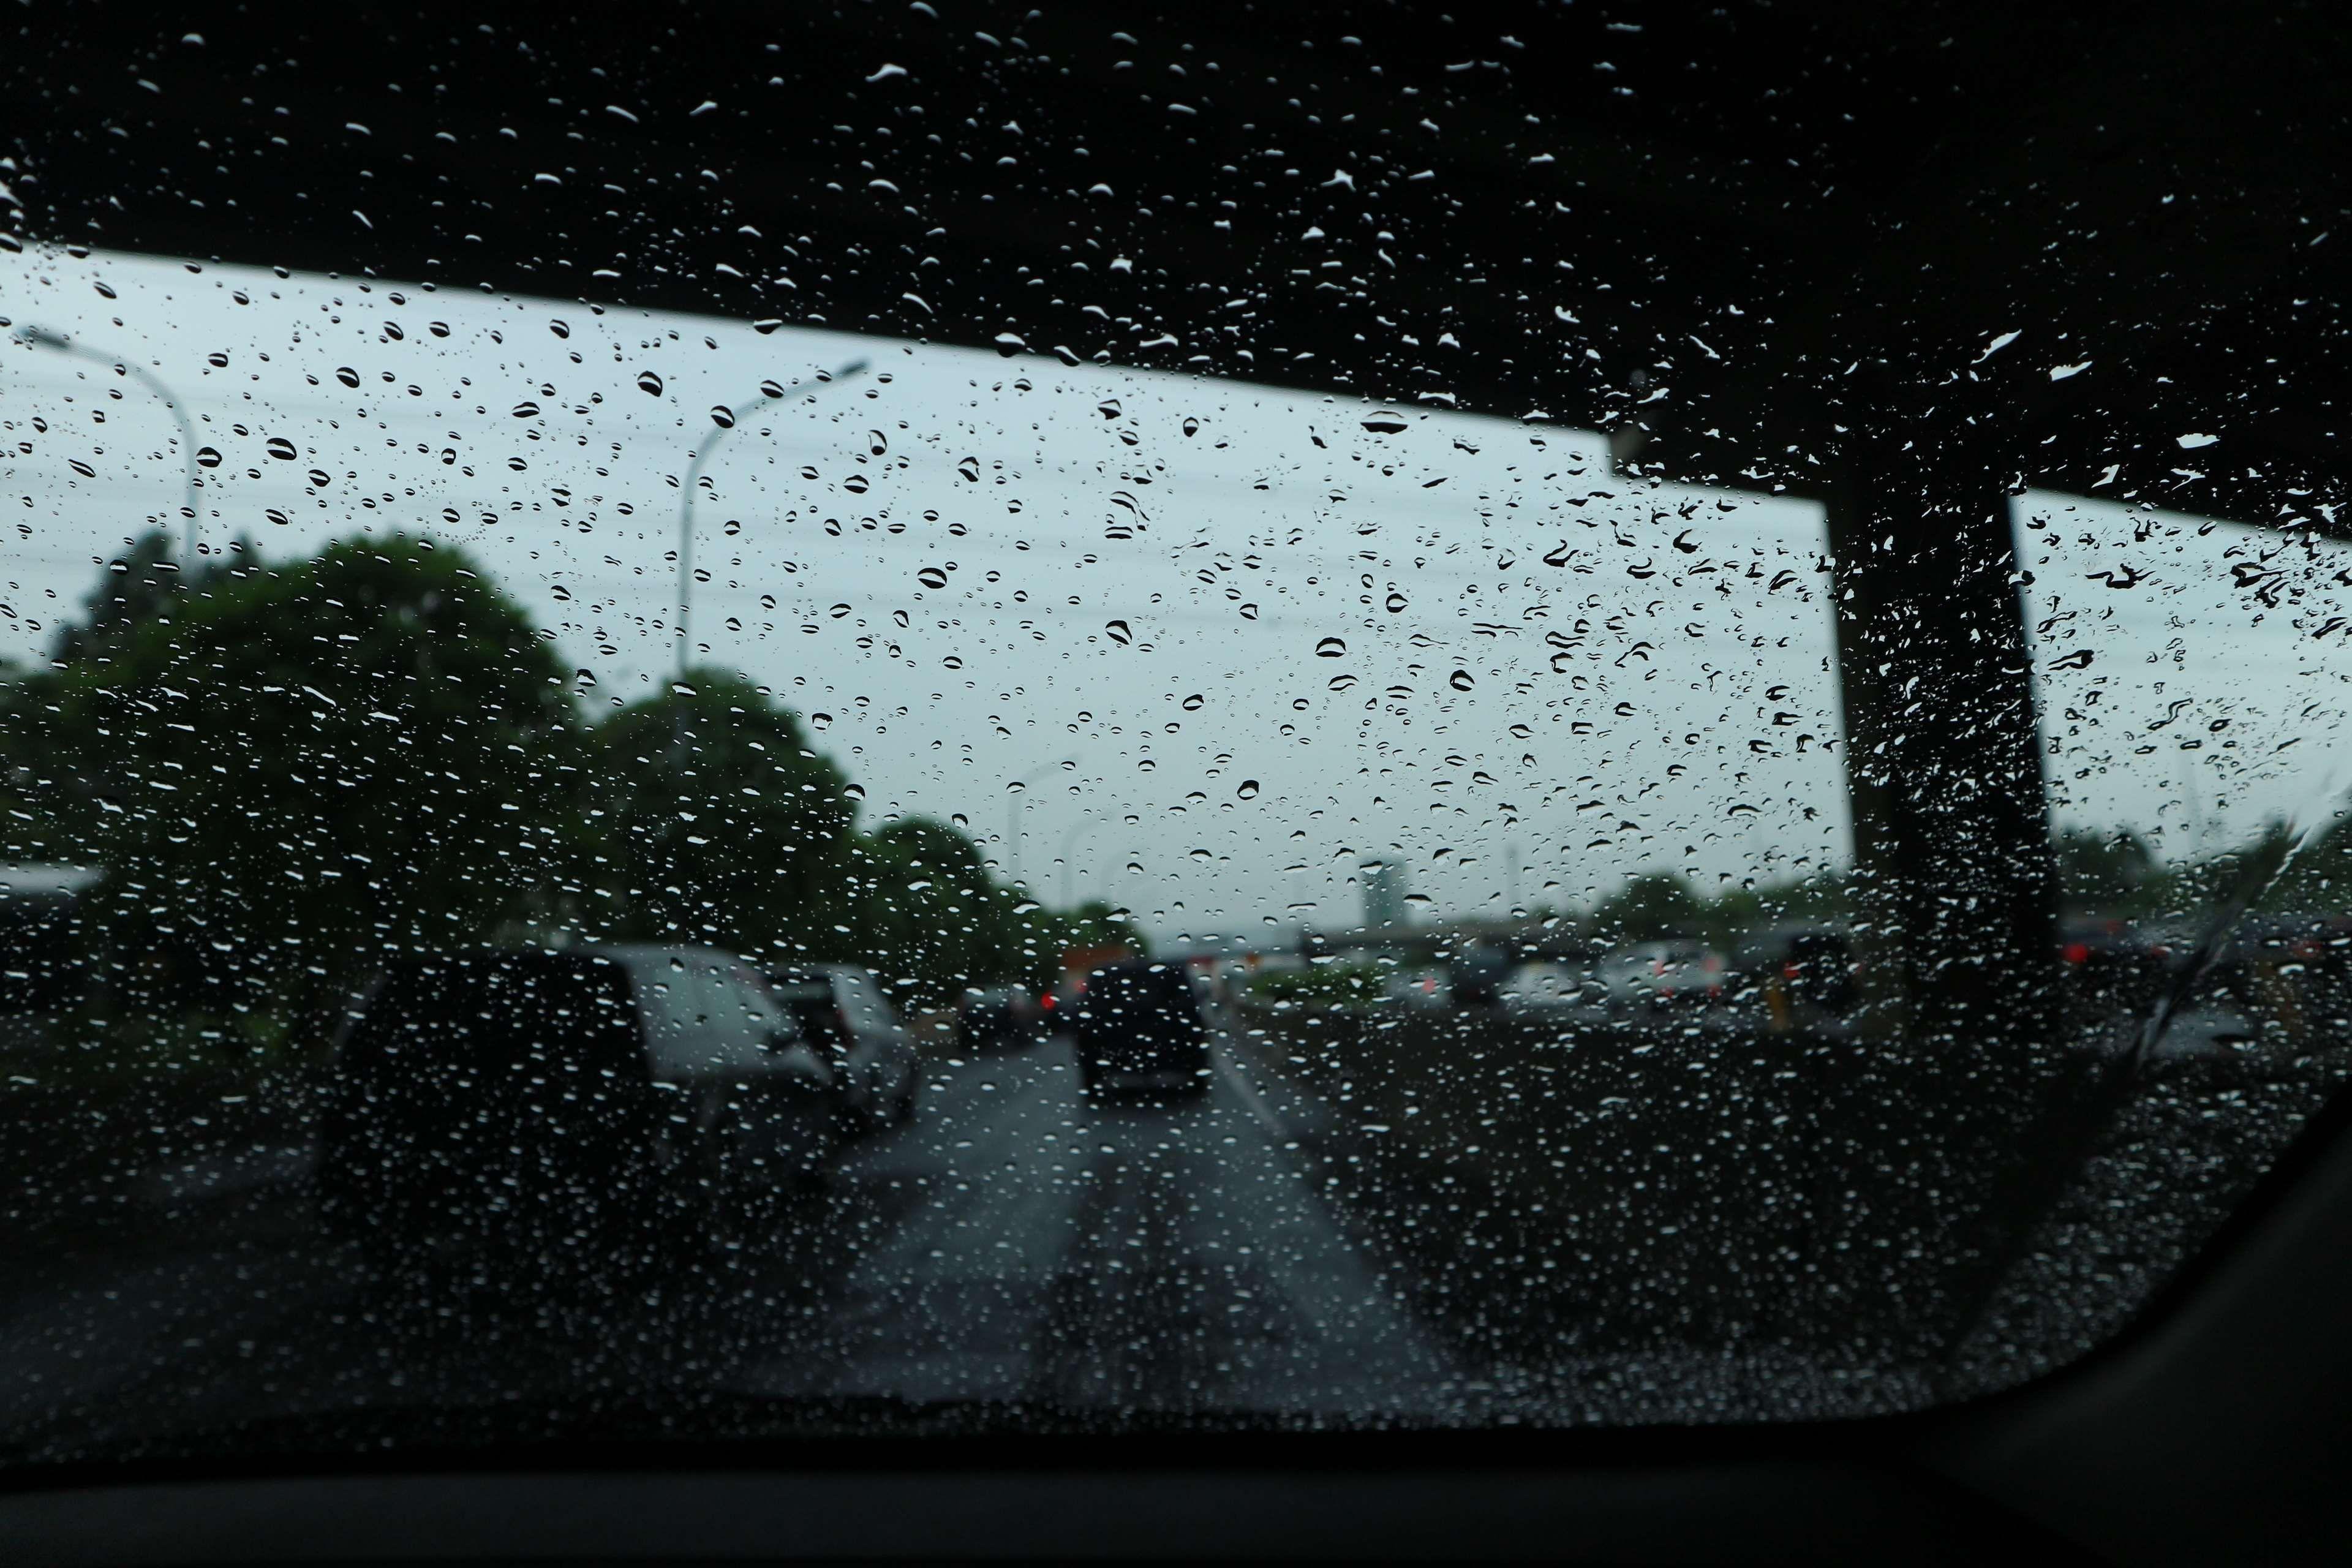 bridge #car #cloudy #cloudy skies #rain #road #storm